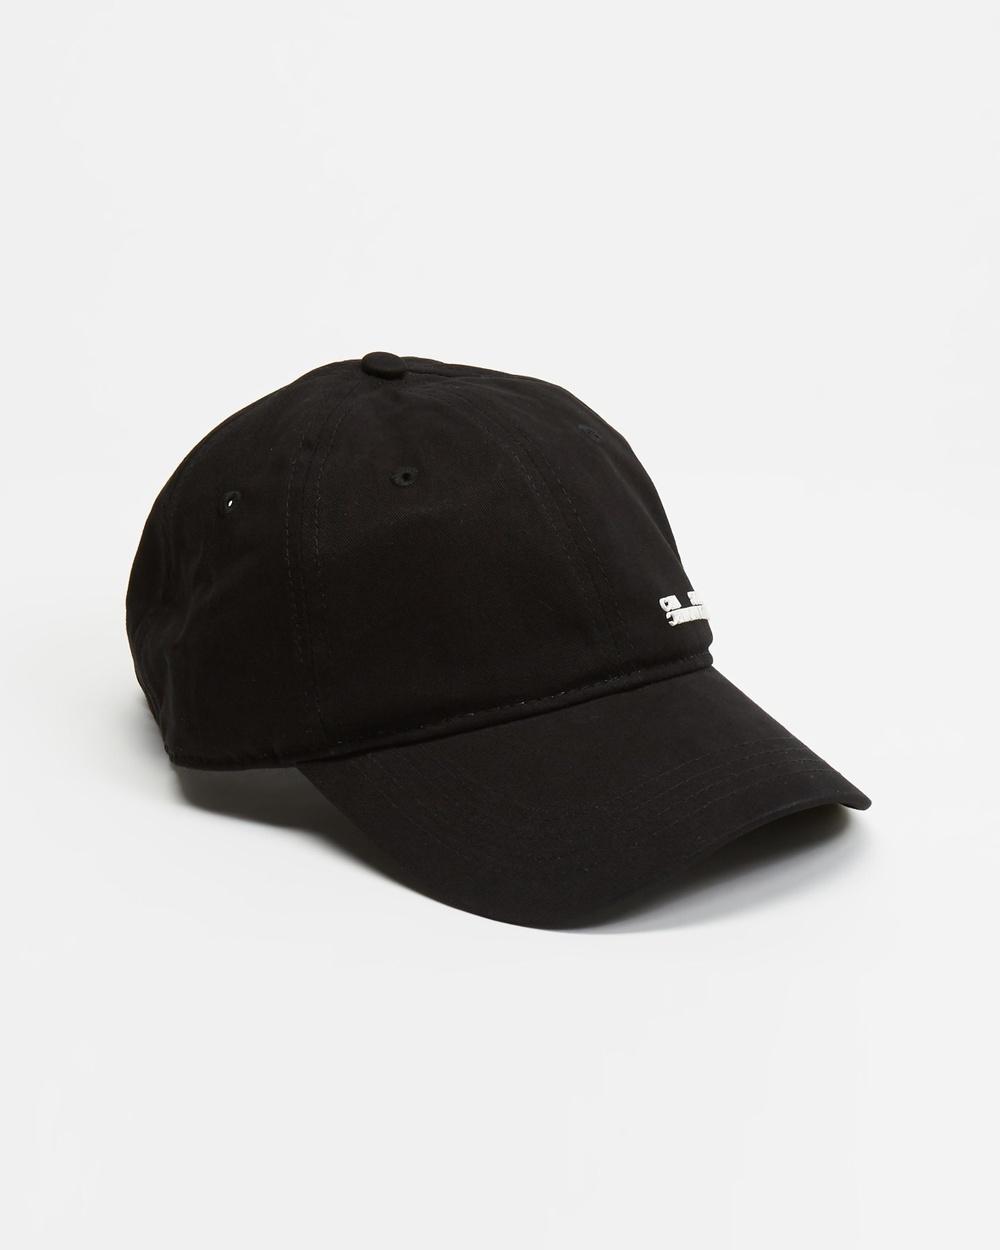 C&M CAMILLA AND MARC James Cap Headwear Black & White